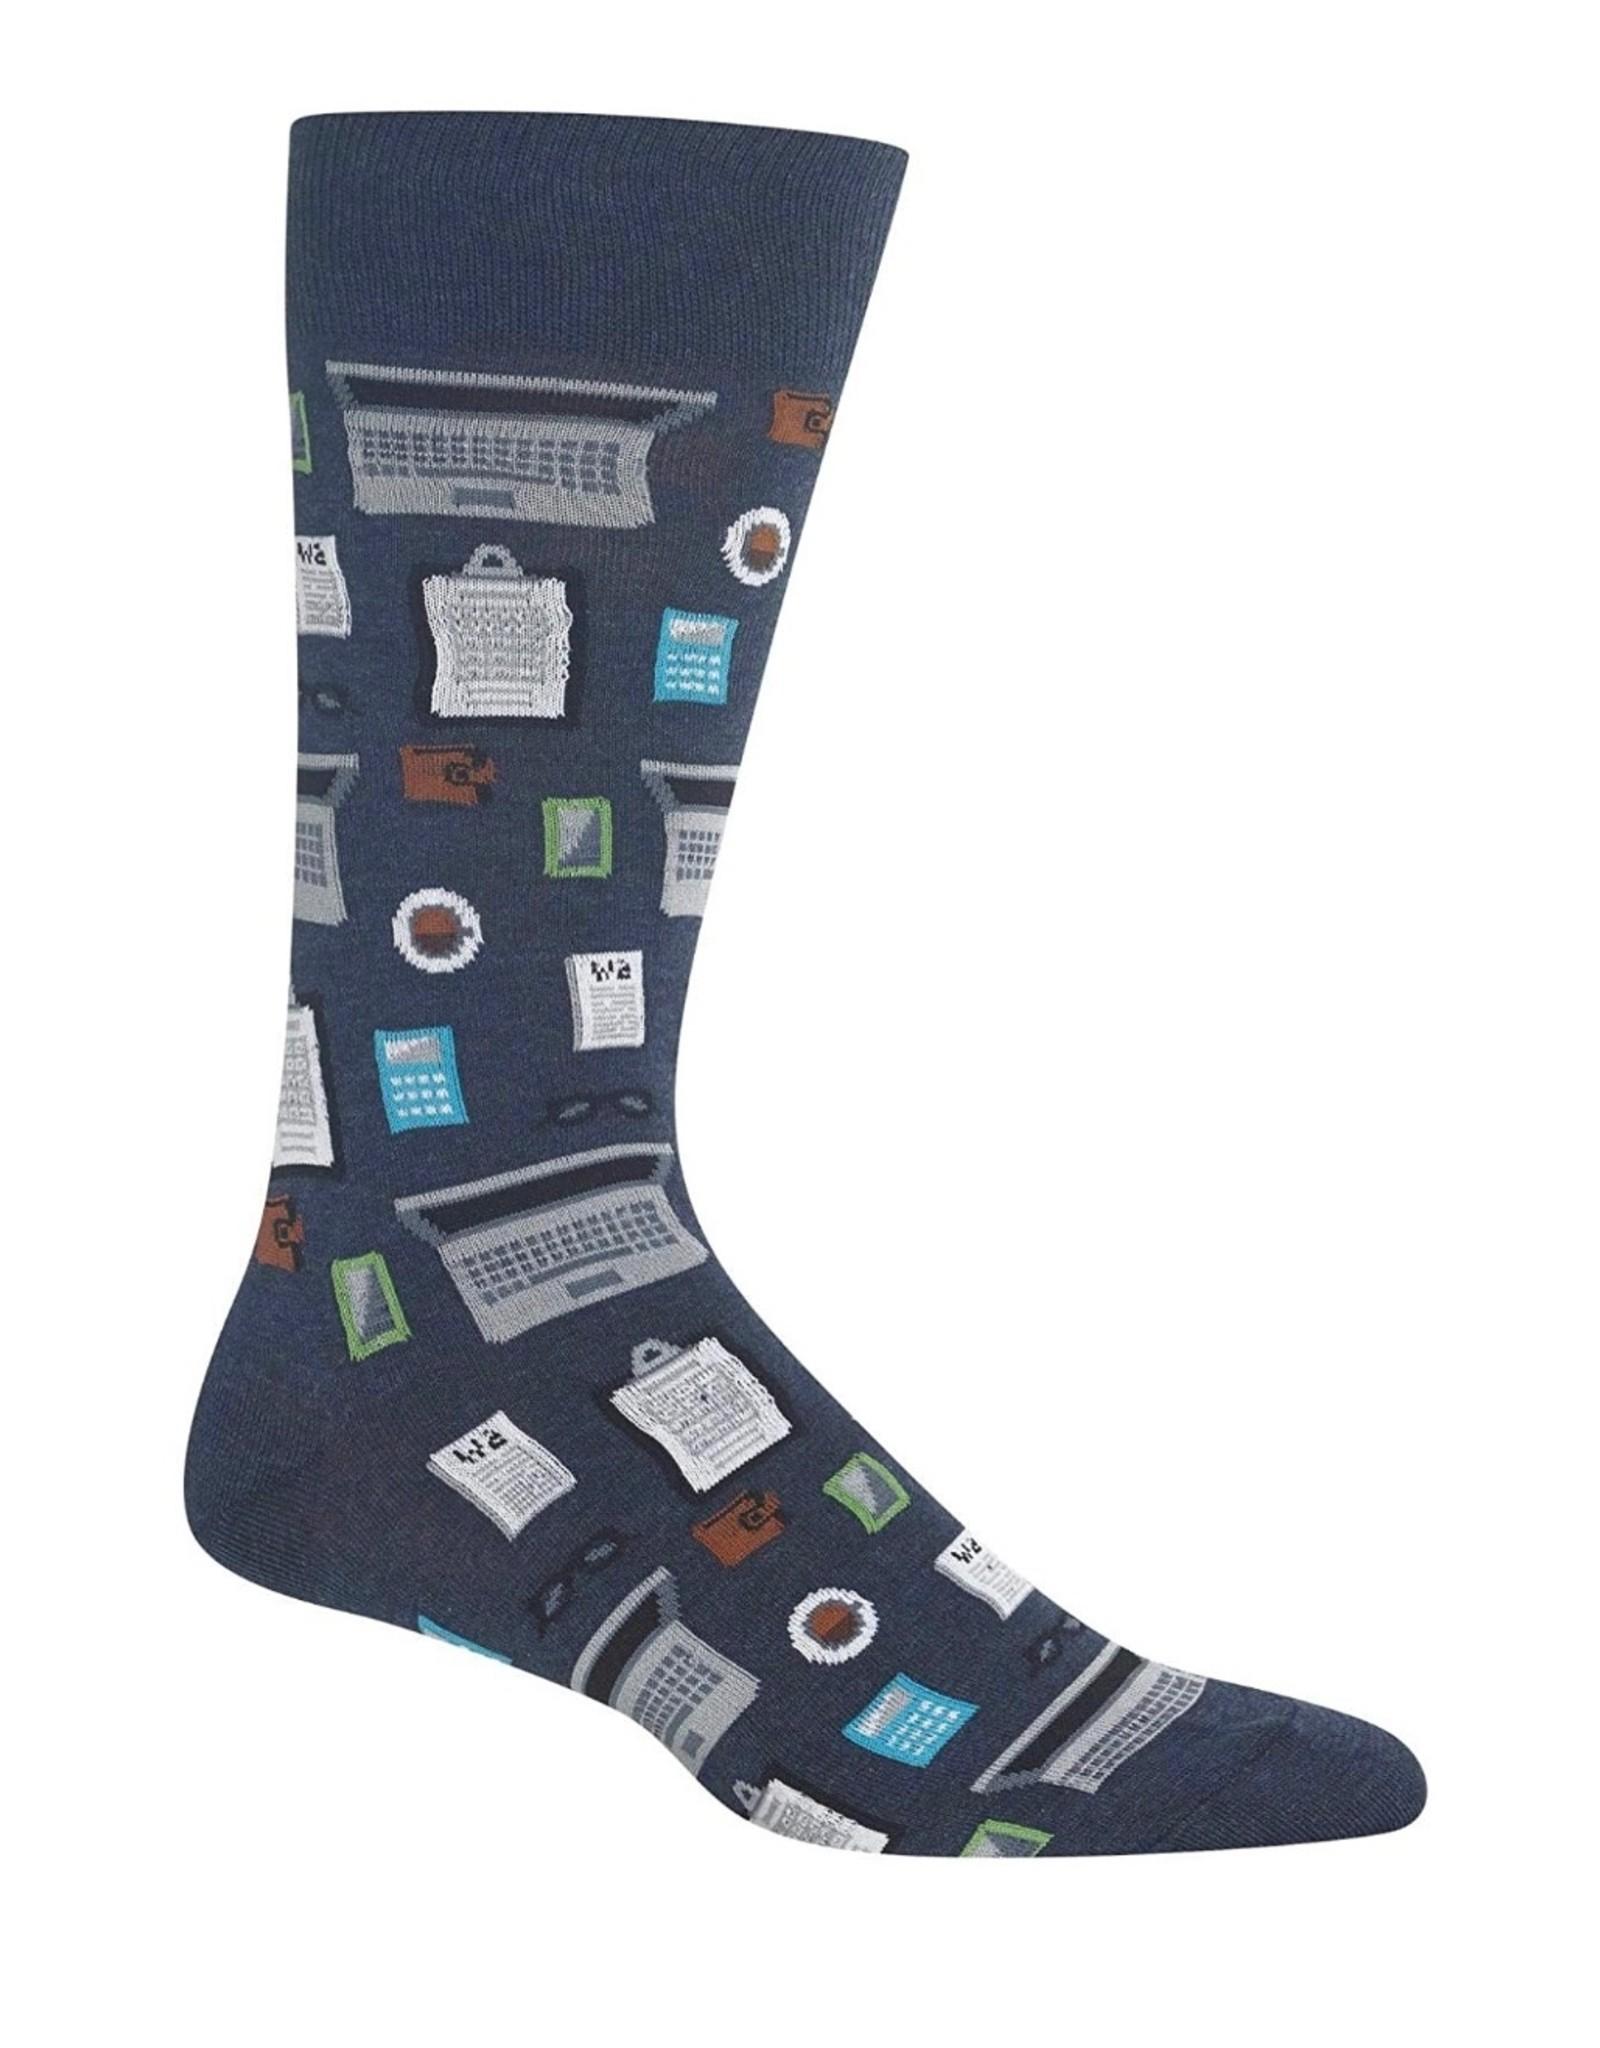 Hotsox Hotsox Men's Accountant Crew Socks HM100782